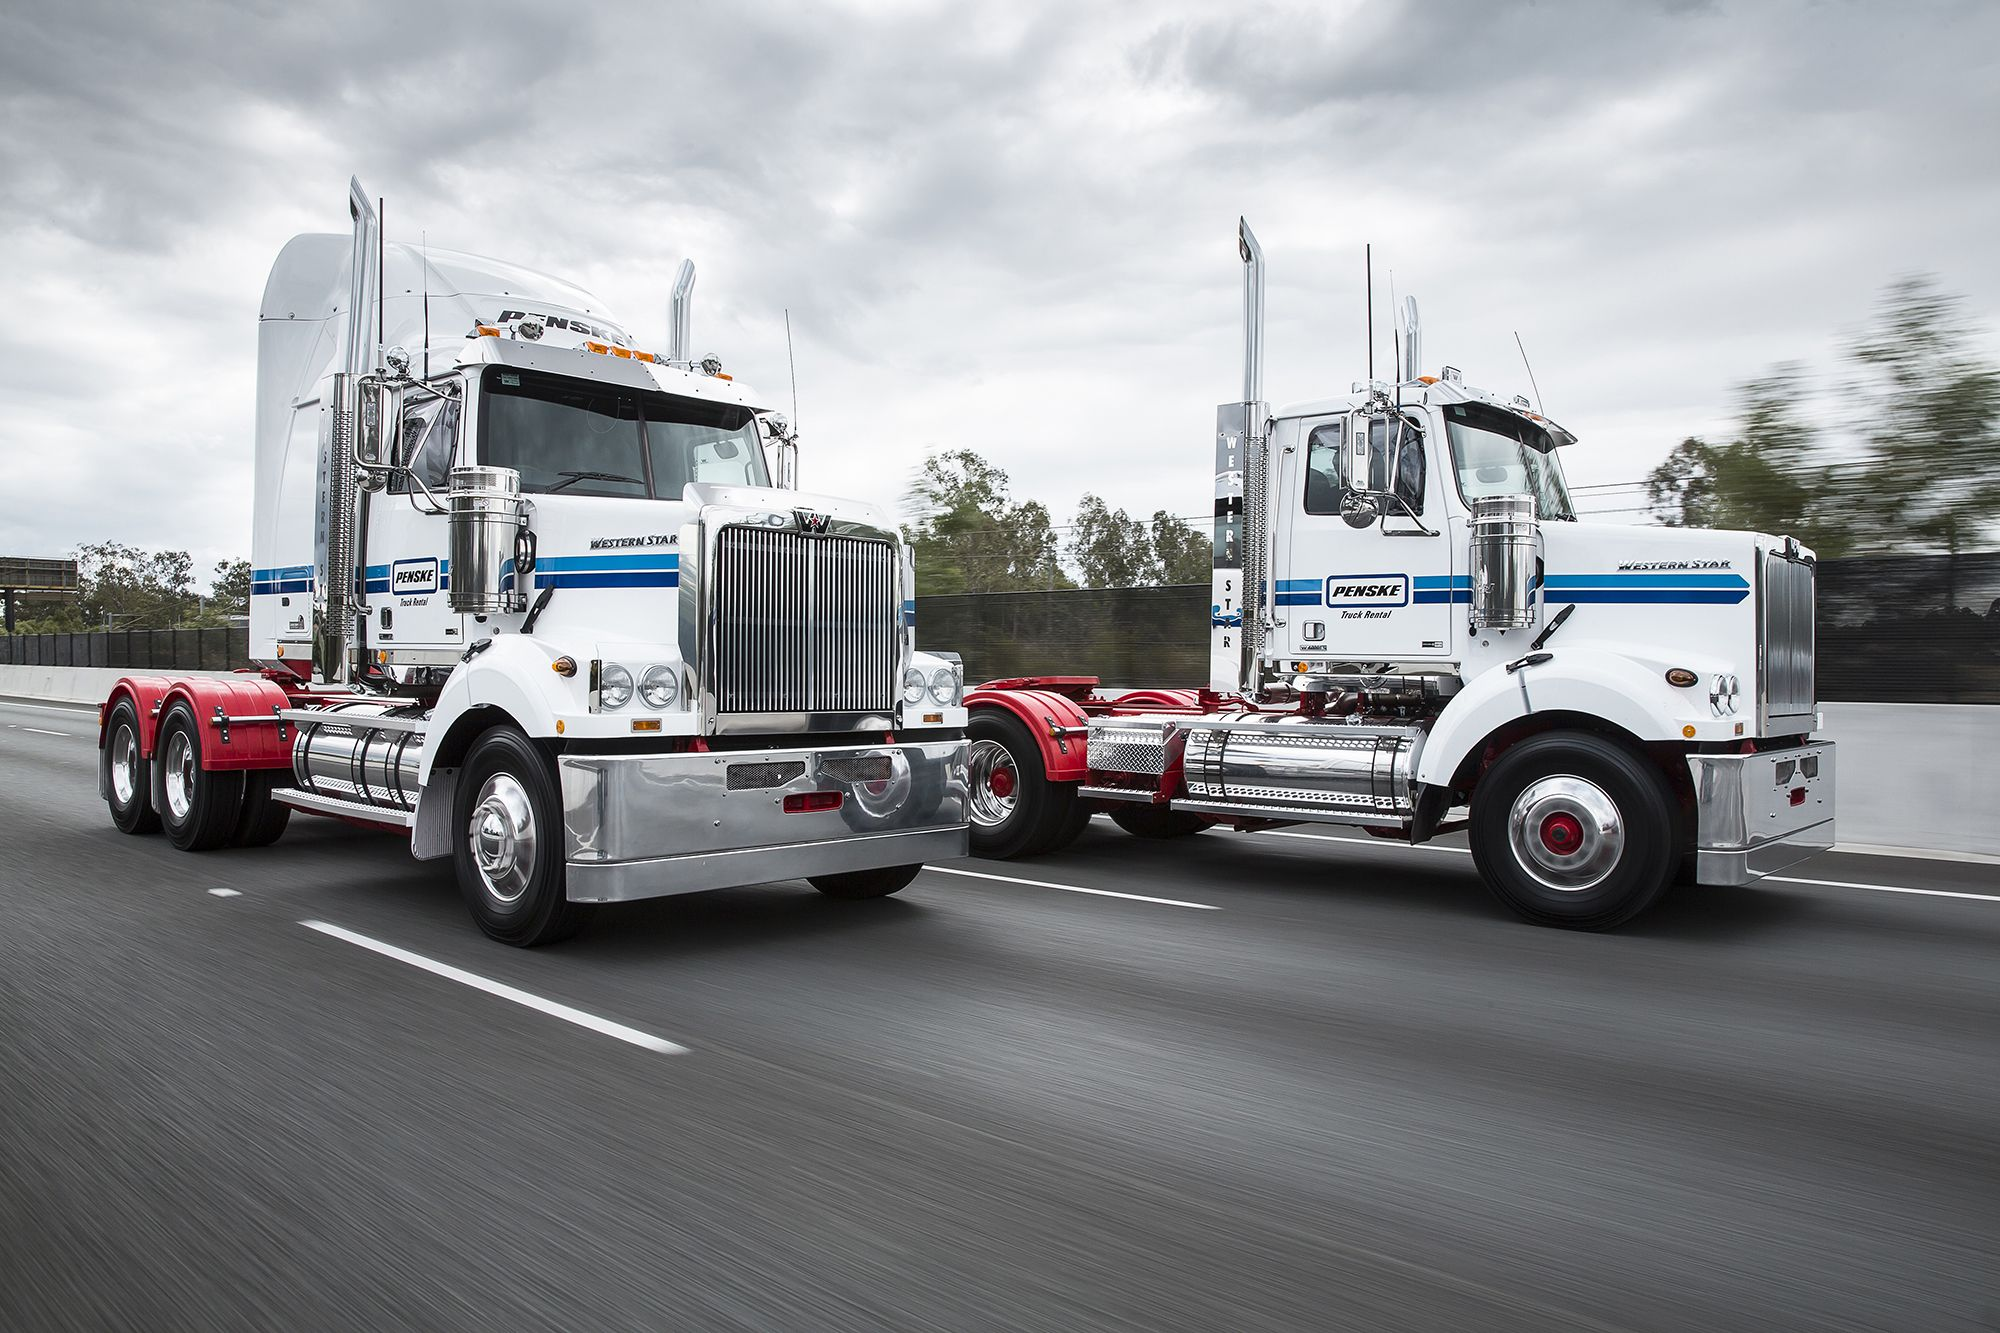 Penske truck rental is now open for business in brisbane australia and rents heavy